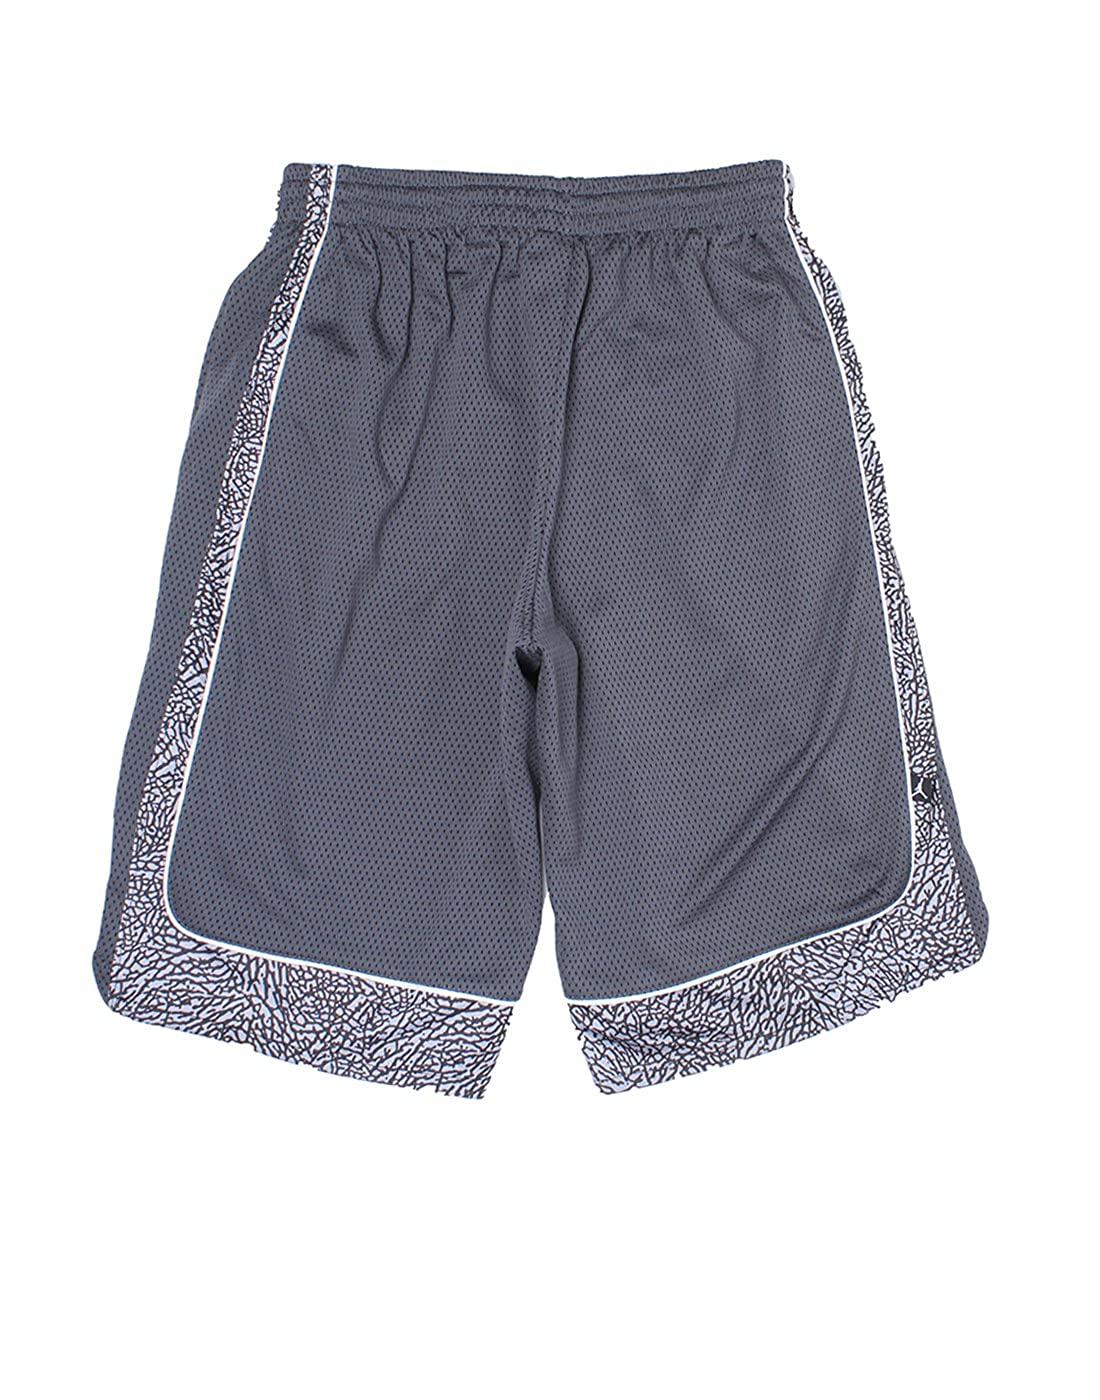 1e9d3bed467c72 Amazon.com  Jordan Nike Boys  Elephants Print Dri-Fit Basketball Shorts   Sports   Outdoors